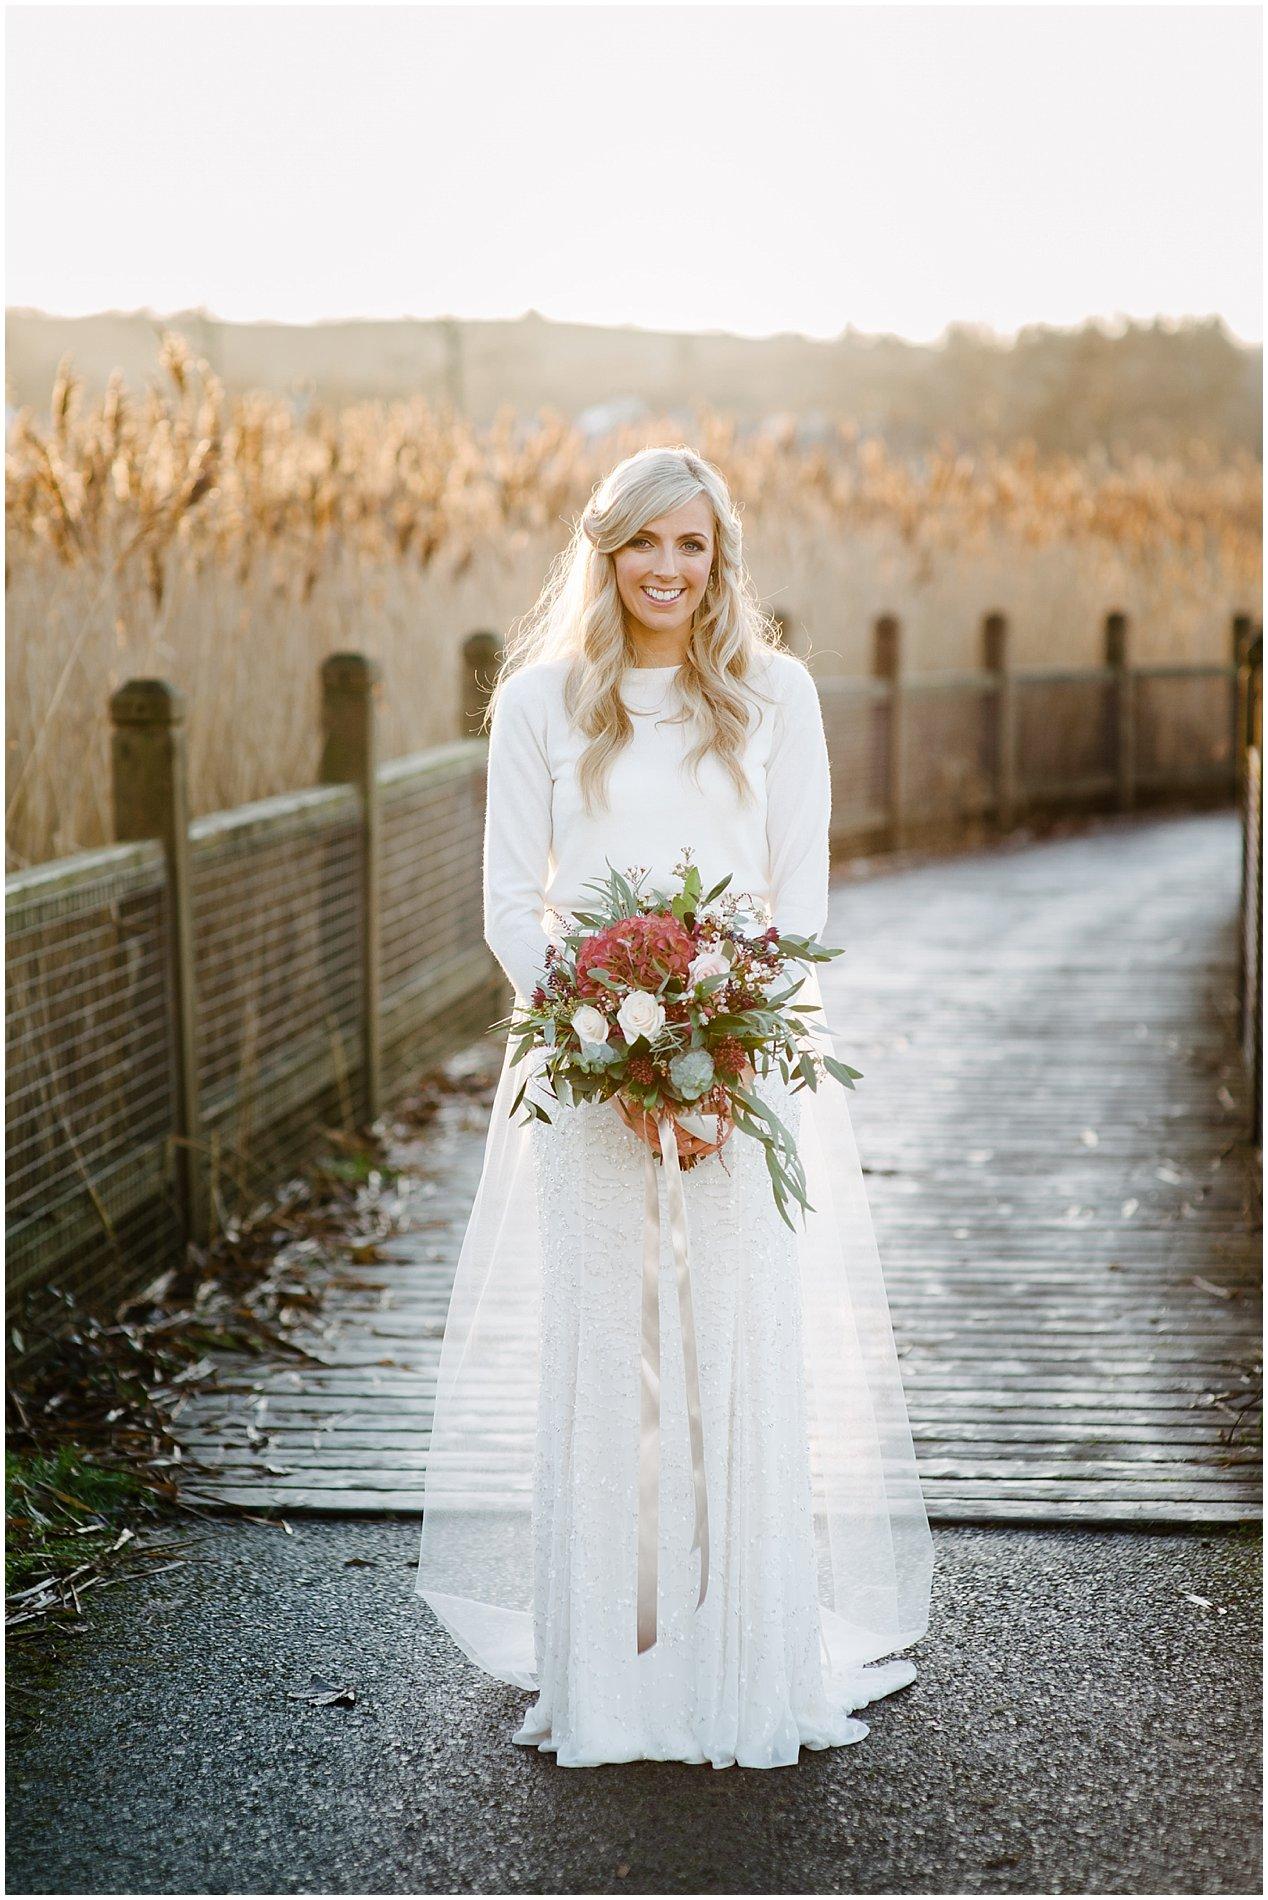 jill_Chris_Lough_Erne_Resort_Wedding_0137.jpg